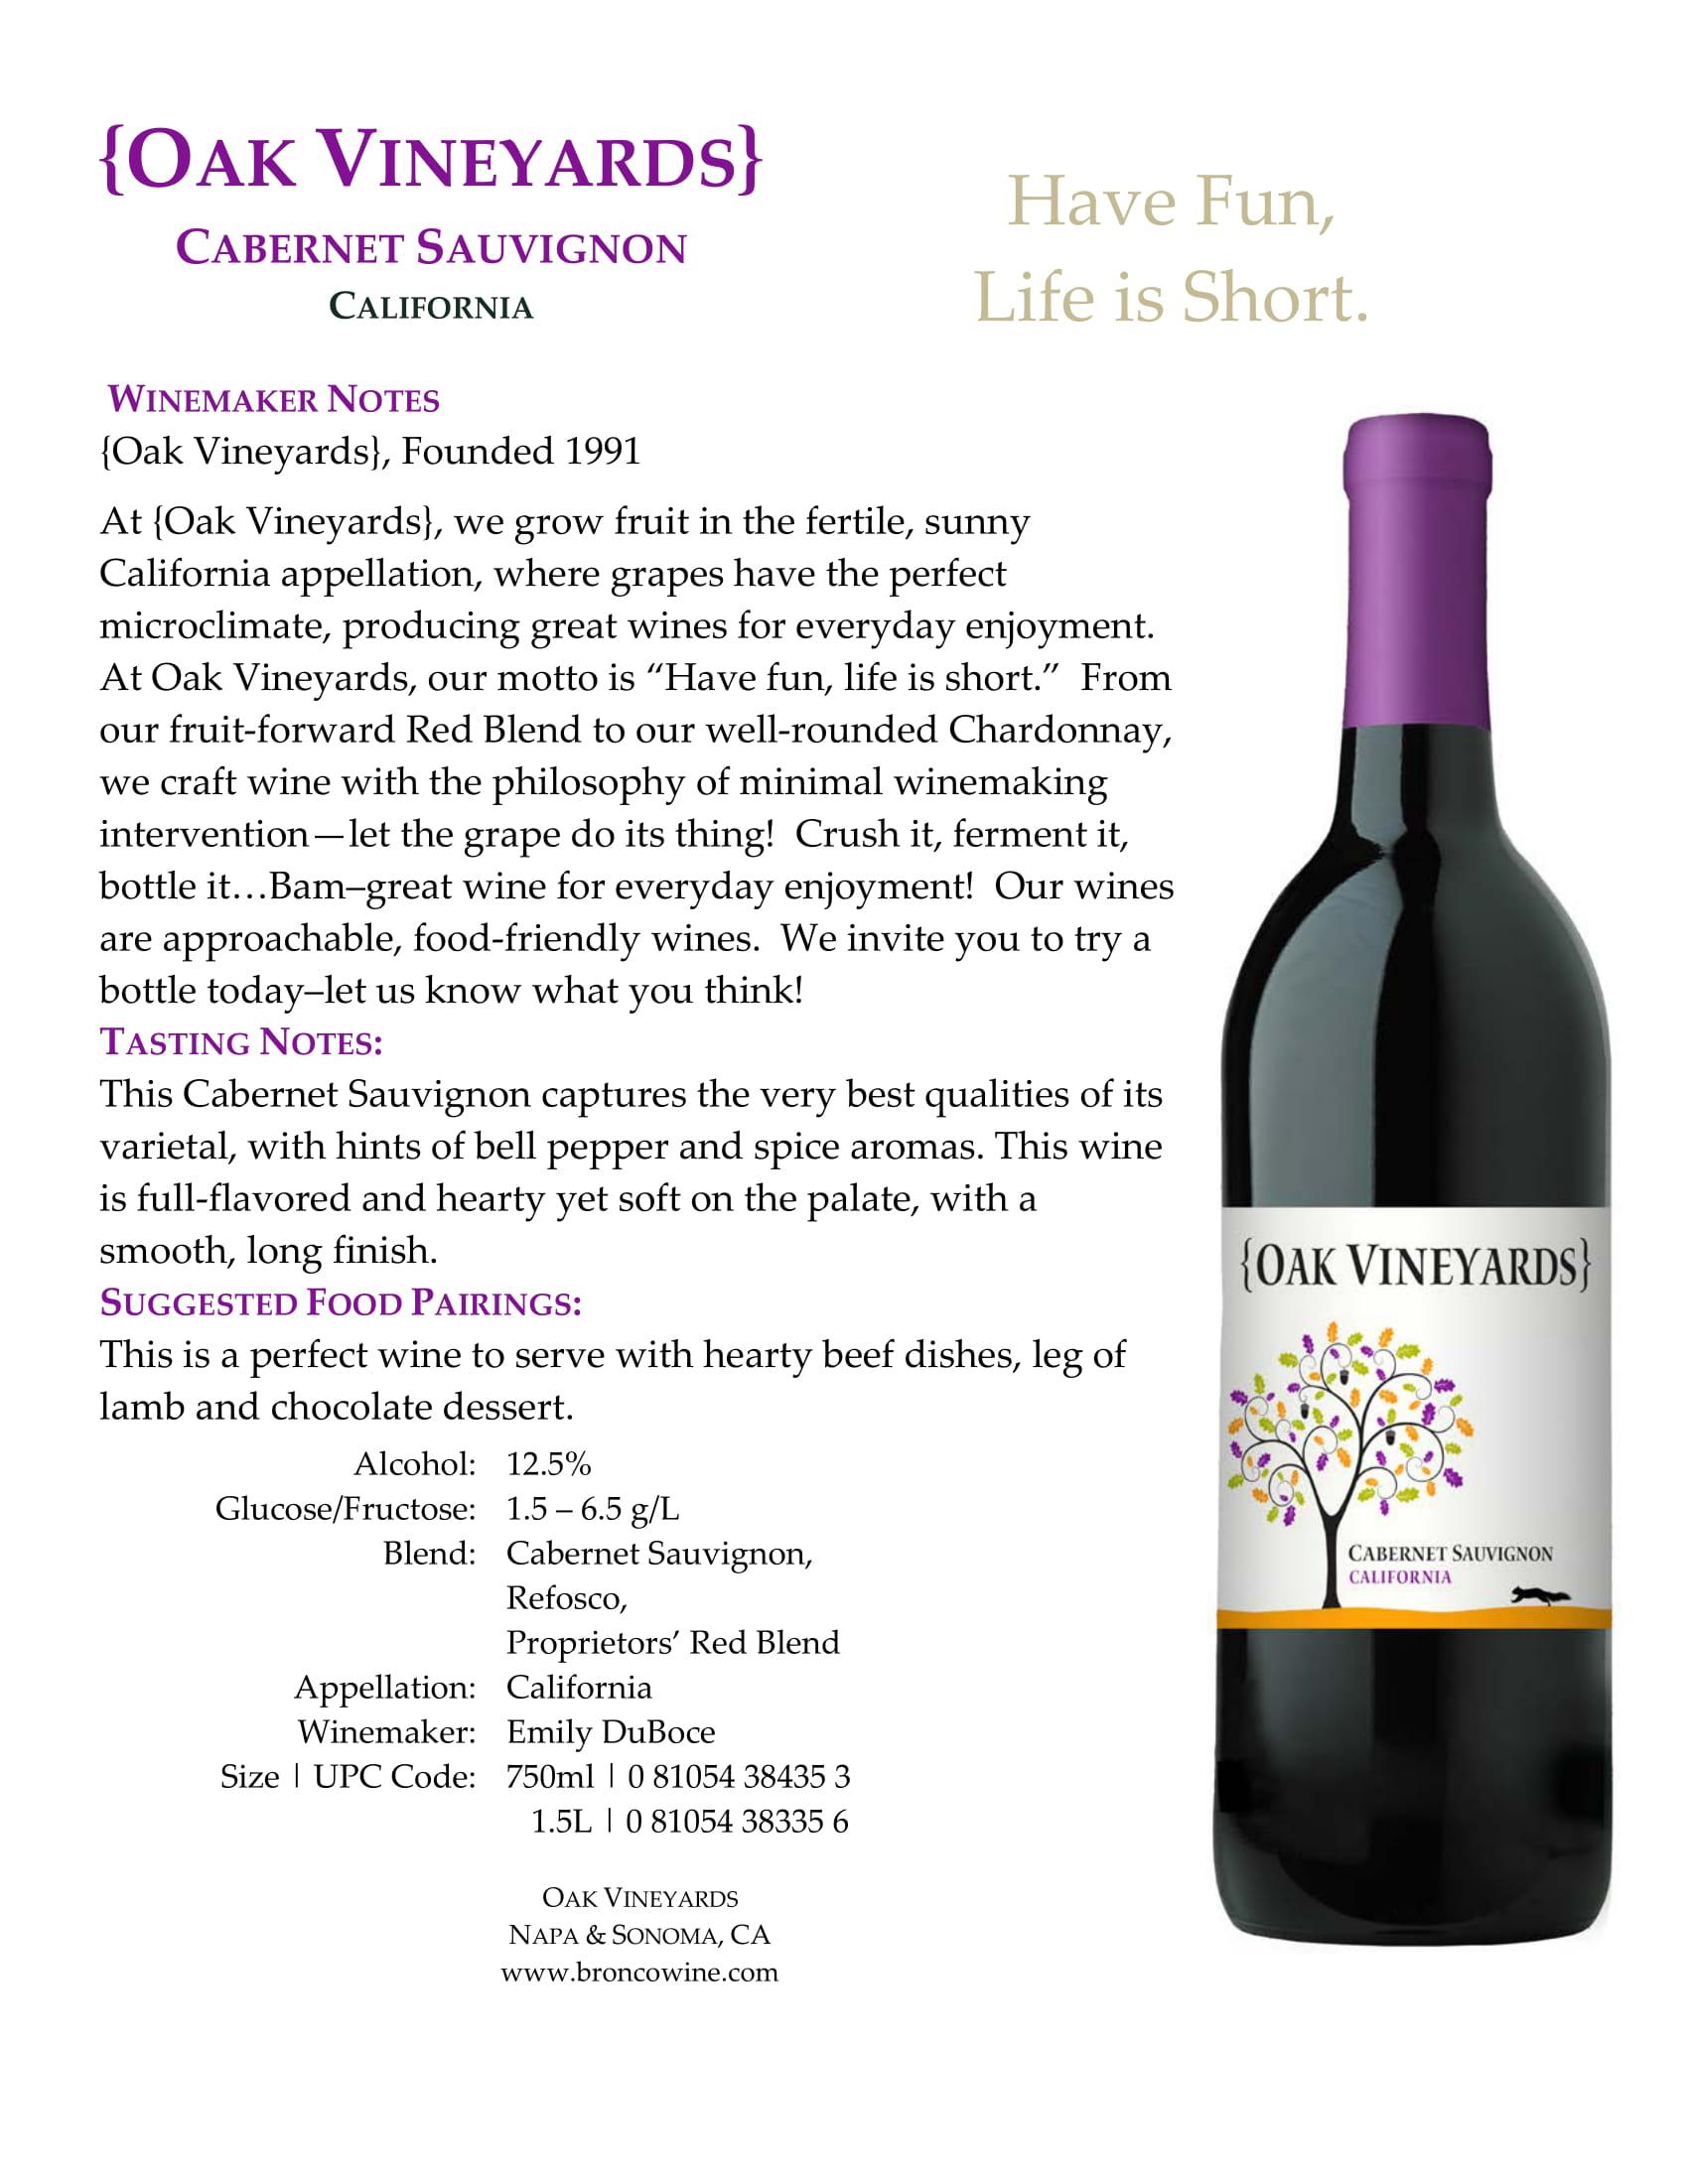 Oak Vineyards Cabernet Sauvignon Tech Sheet